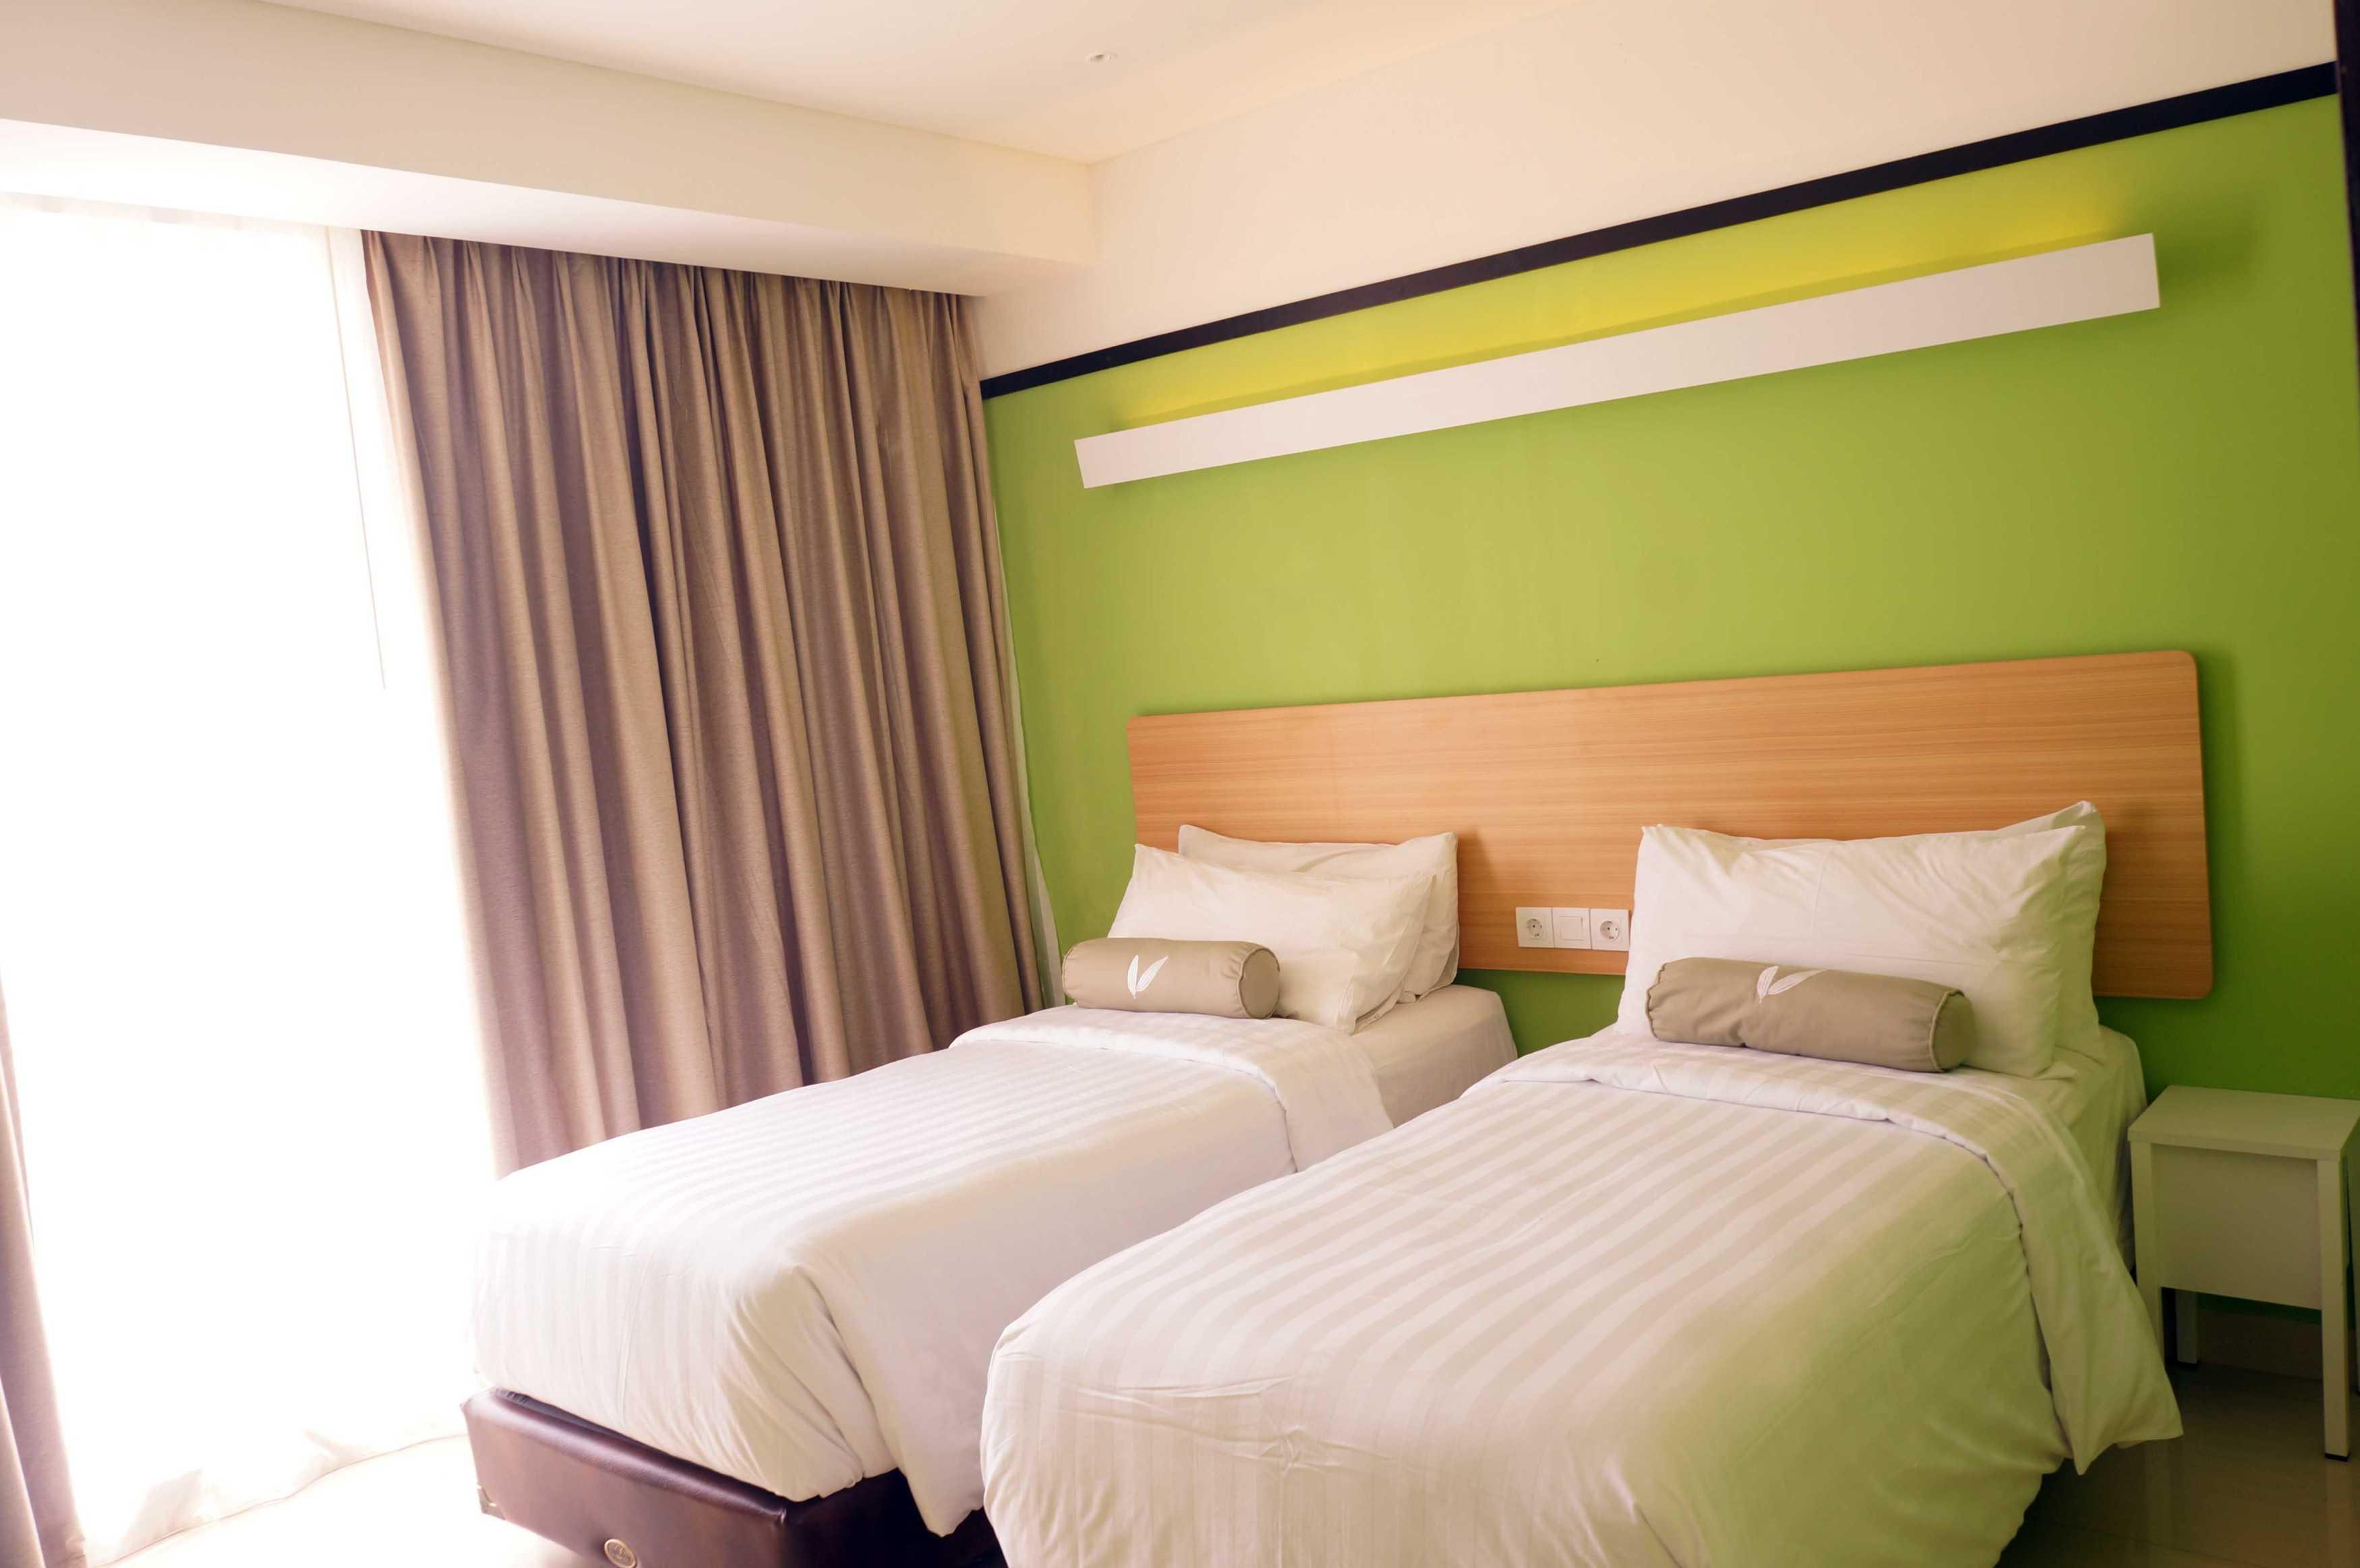 Arkitekt.id Executive Suite No 3 Clove Garden Hotel, Bandung Clove Garden Hotel, Bandung Twin Bedroom Minimalis  29460